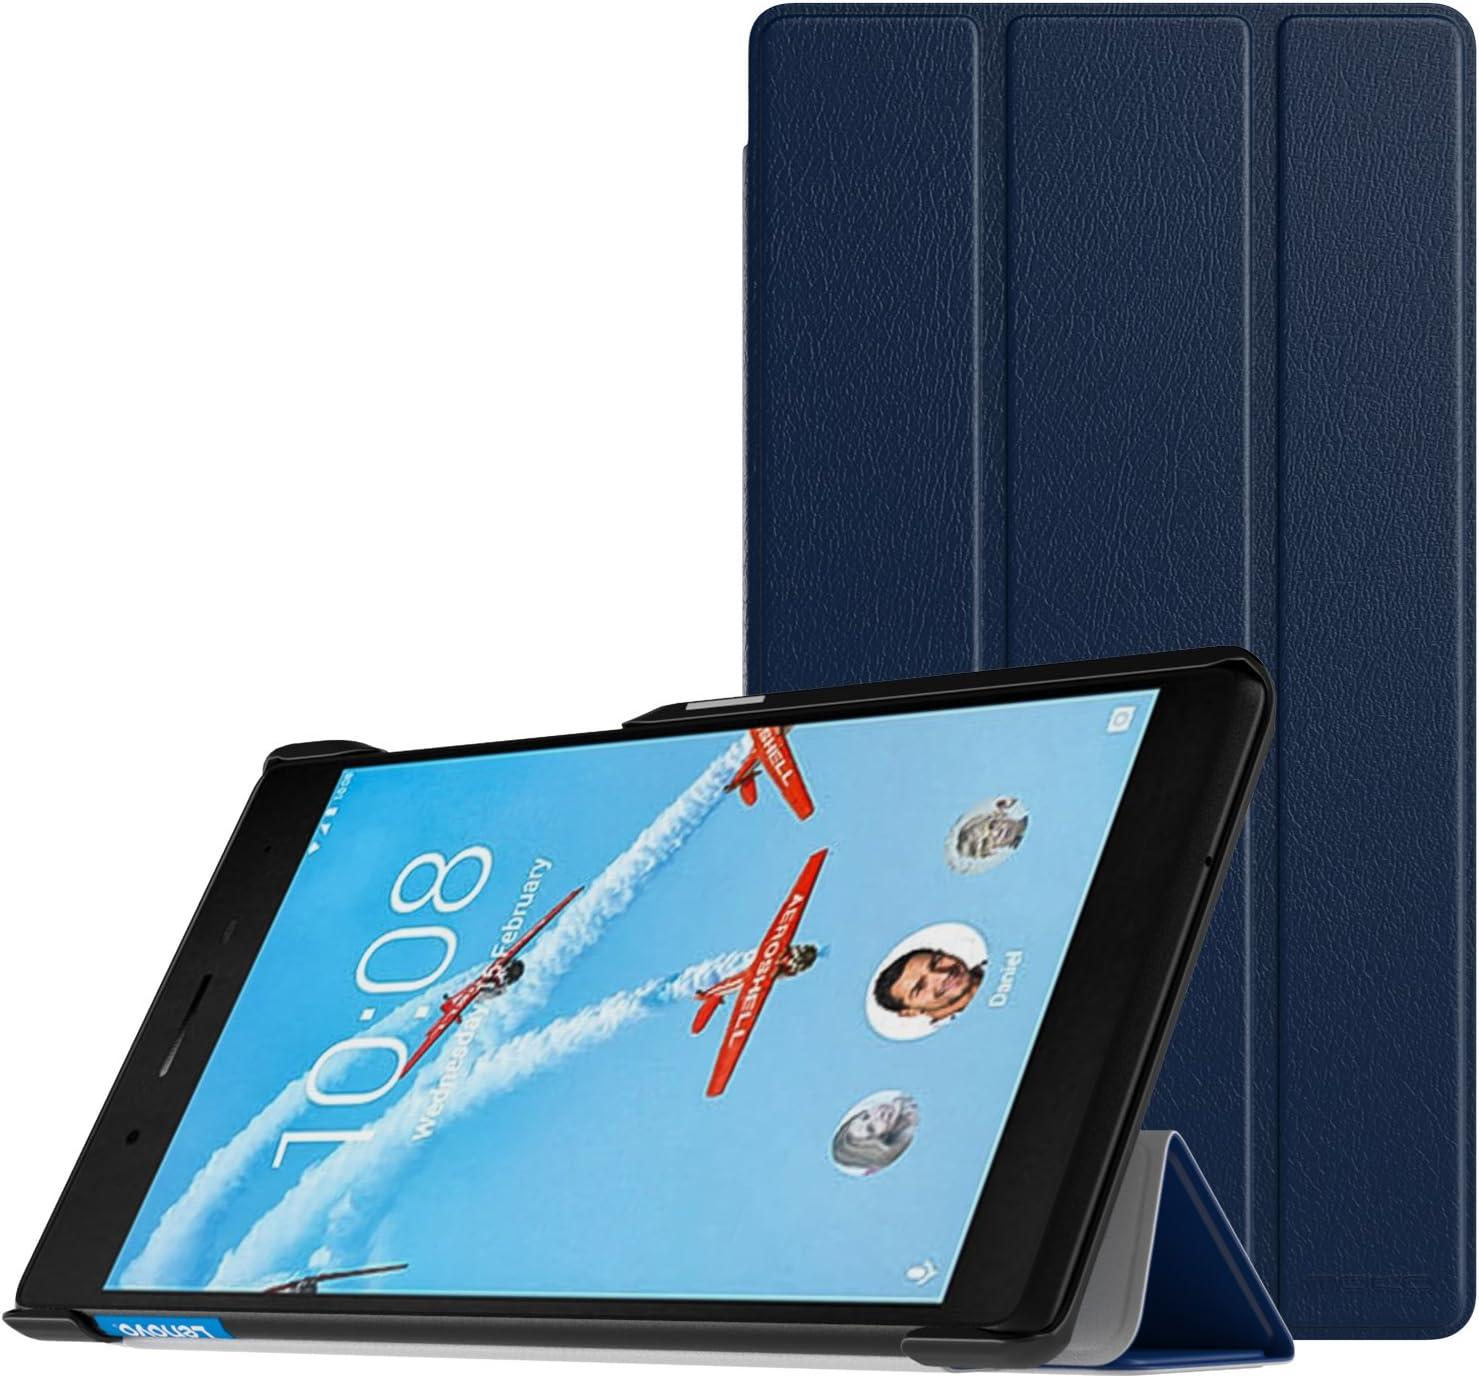 "MoKo Lenovo Tab 7 Essential Case - Ultra Compact Protection Slim Lightweight Smart Shell Stand Cover Case for Lenovo Tab 7 Essential Tablet 2017 (NOT FIT Lenovo Tab 3 Essential 7""), Indigo"